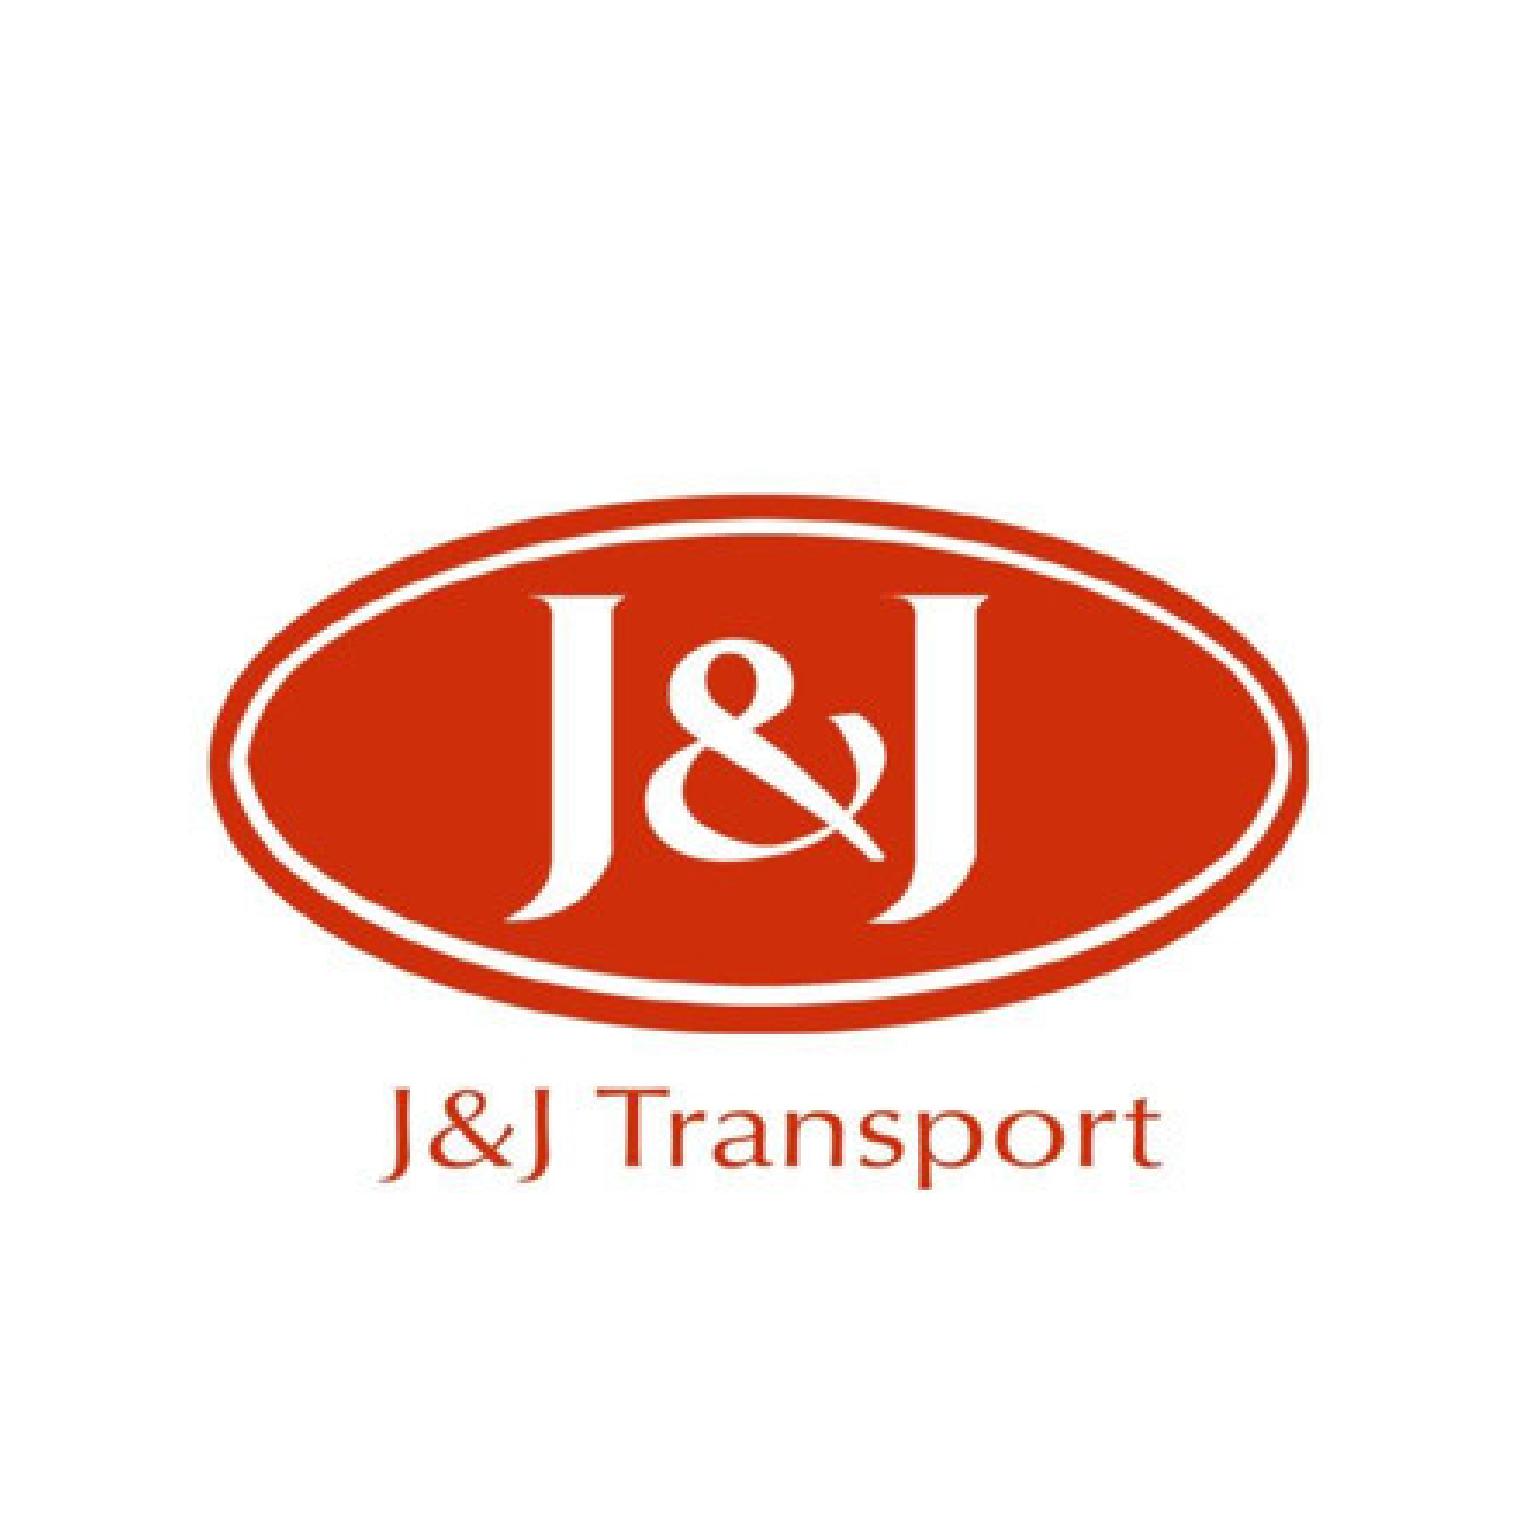 J & J Transport